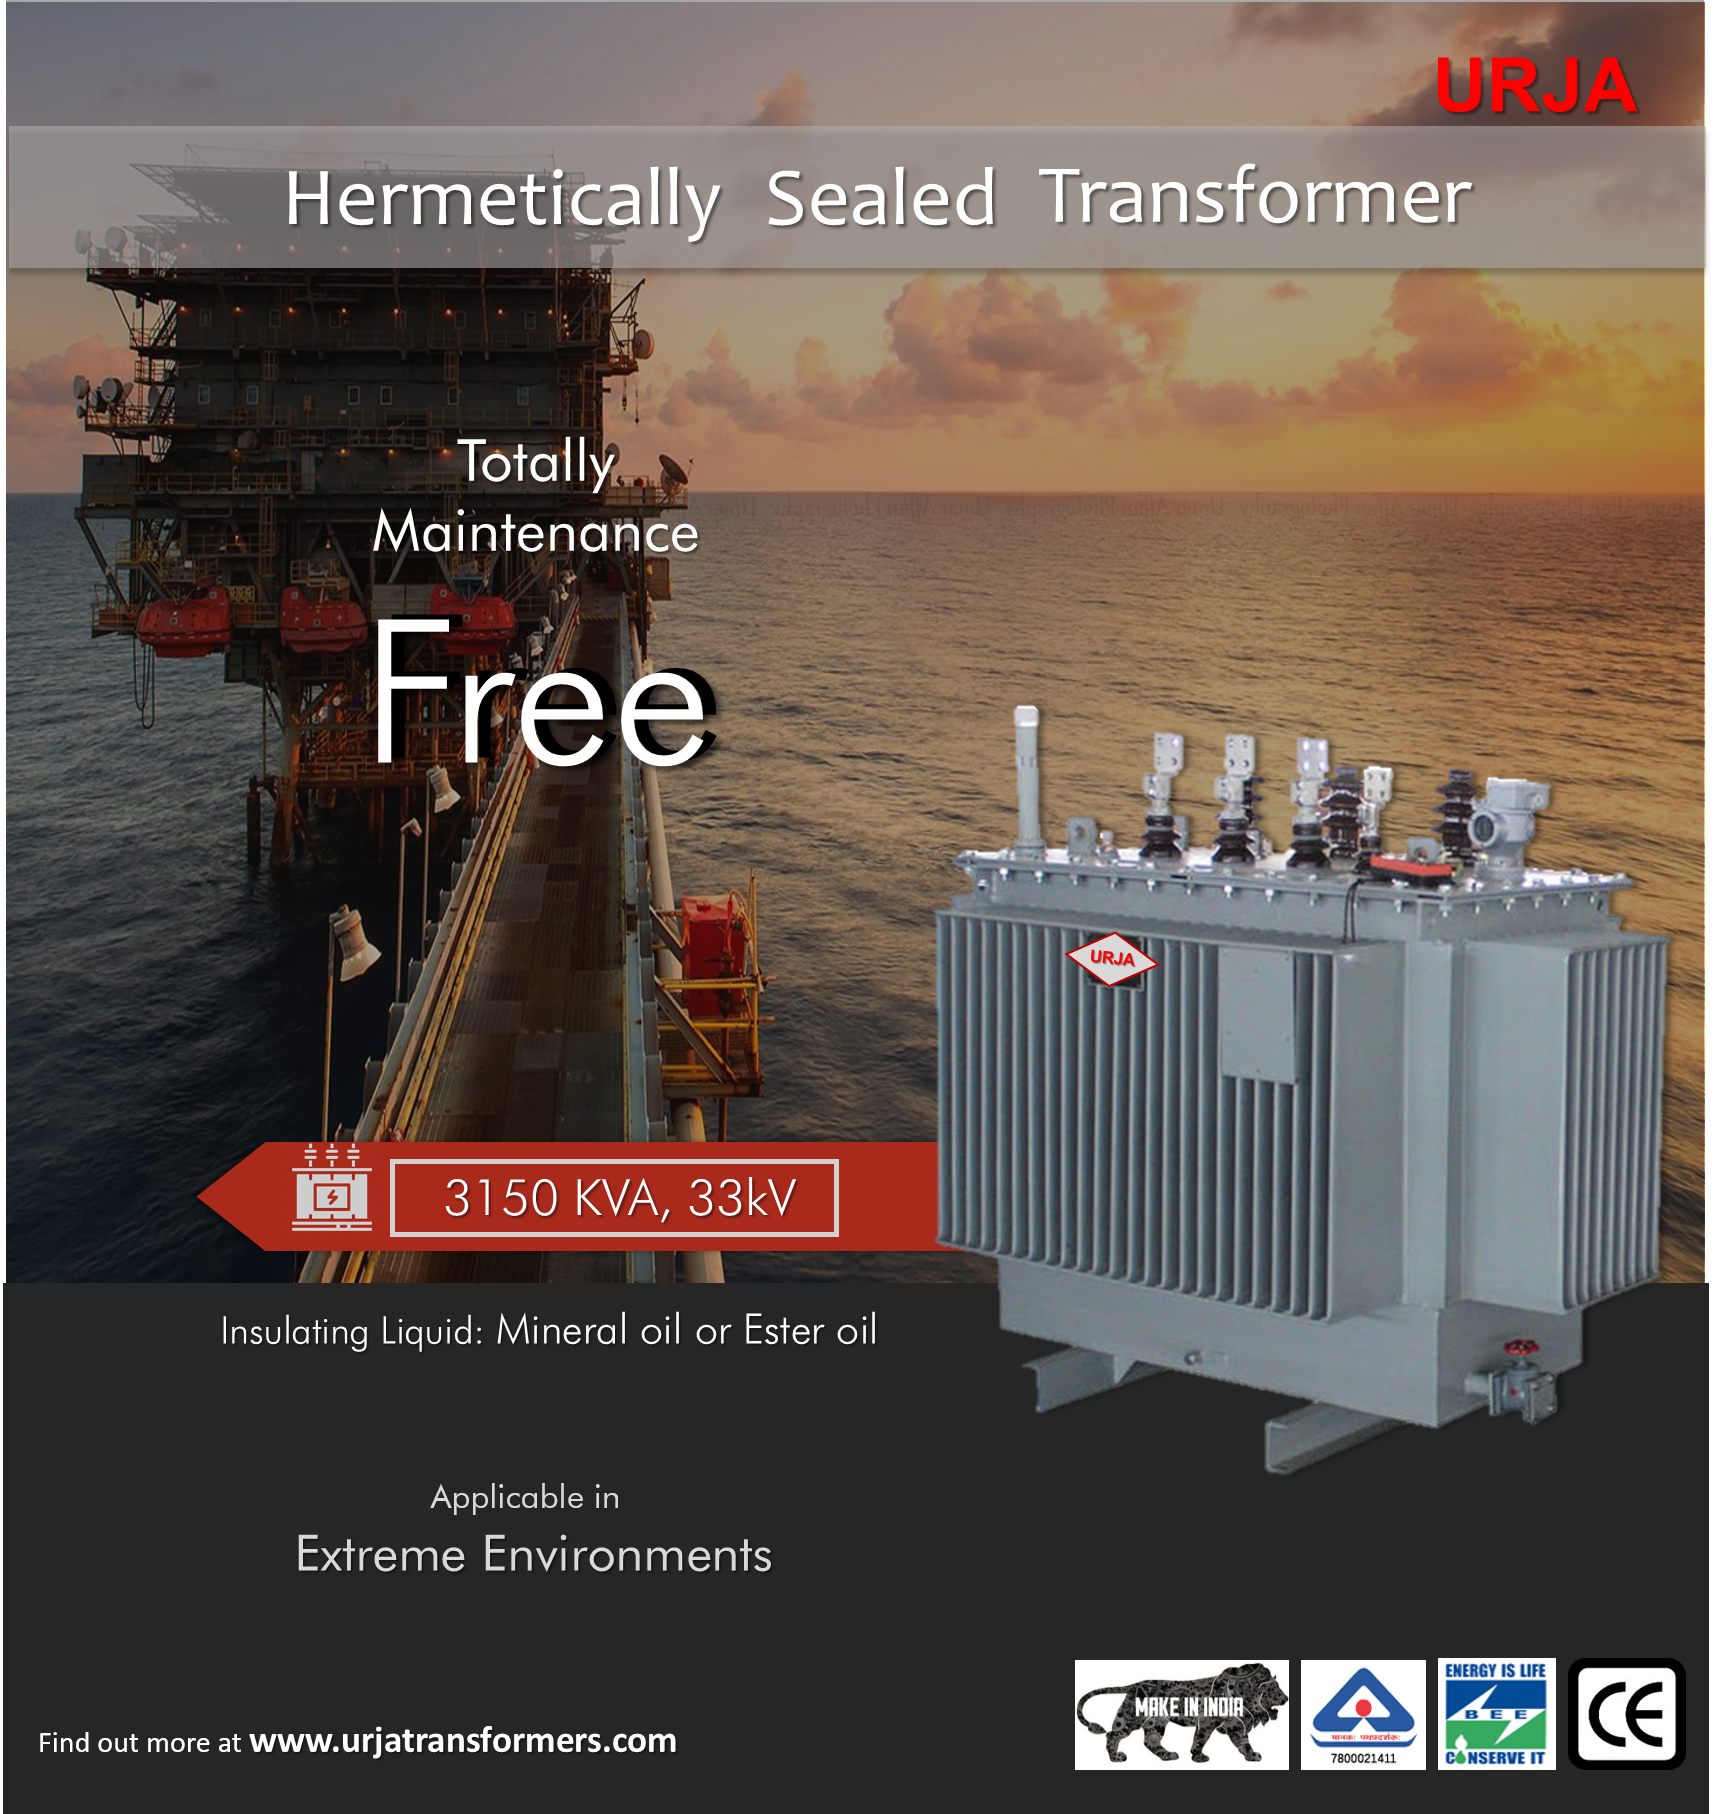 Hermetically Sealed Transformer